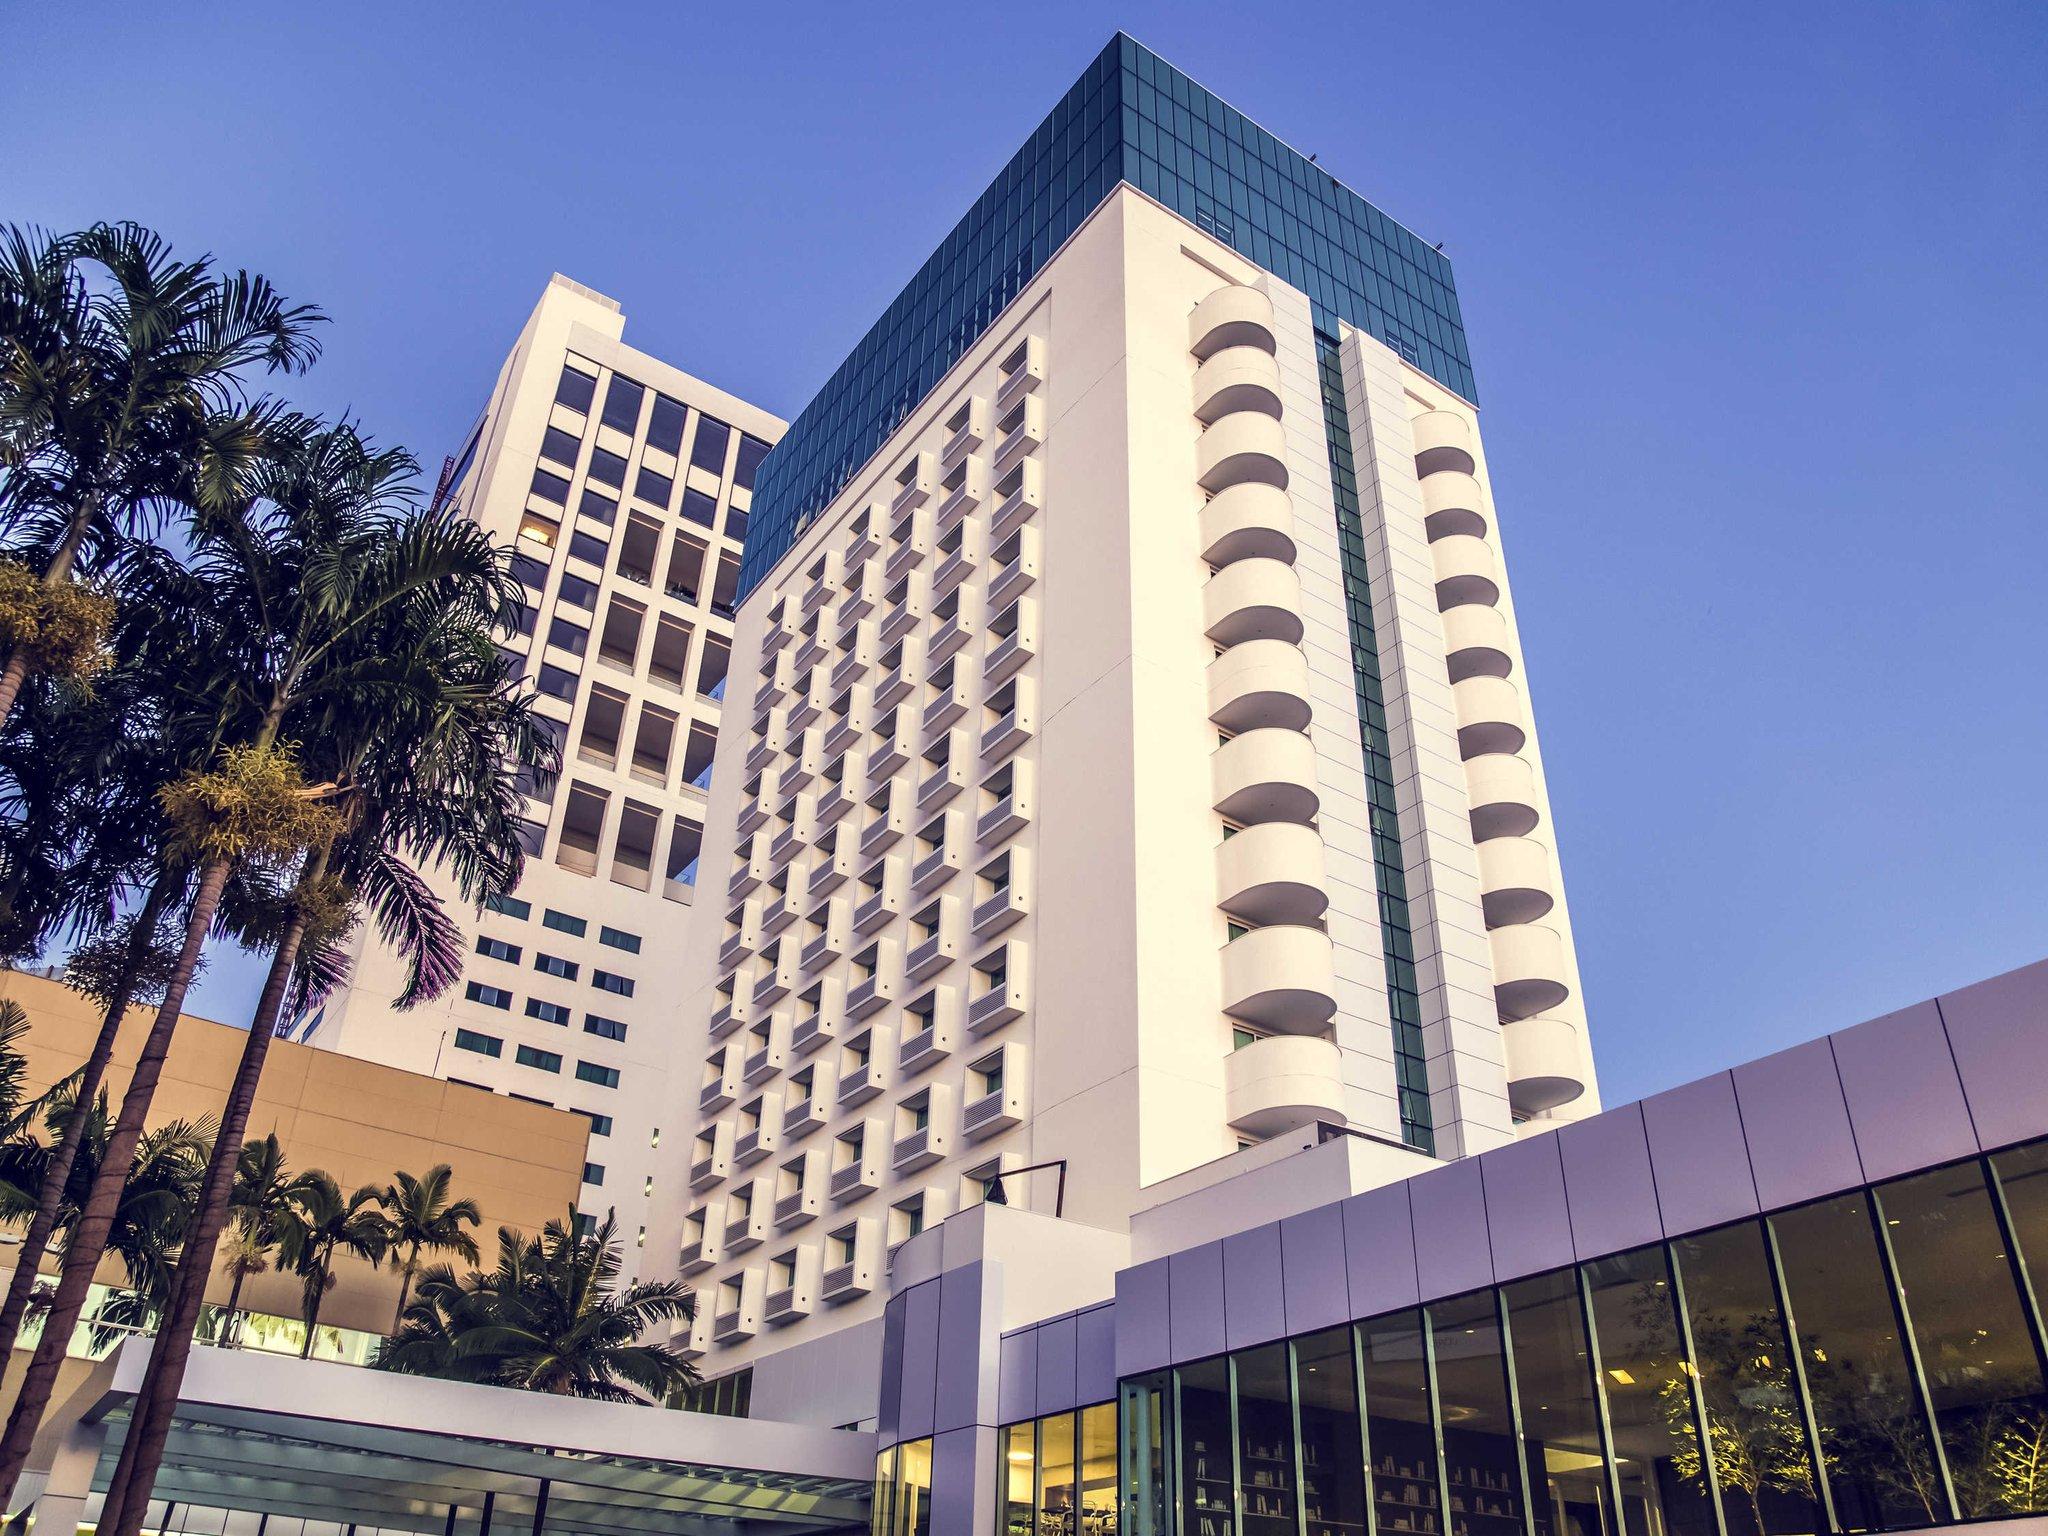 Mercure Uberlandia Plaza Shopping Hotel